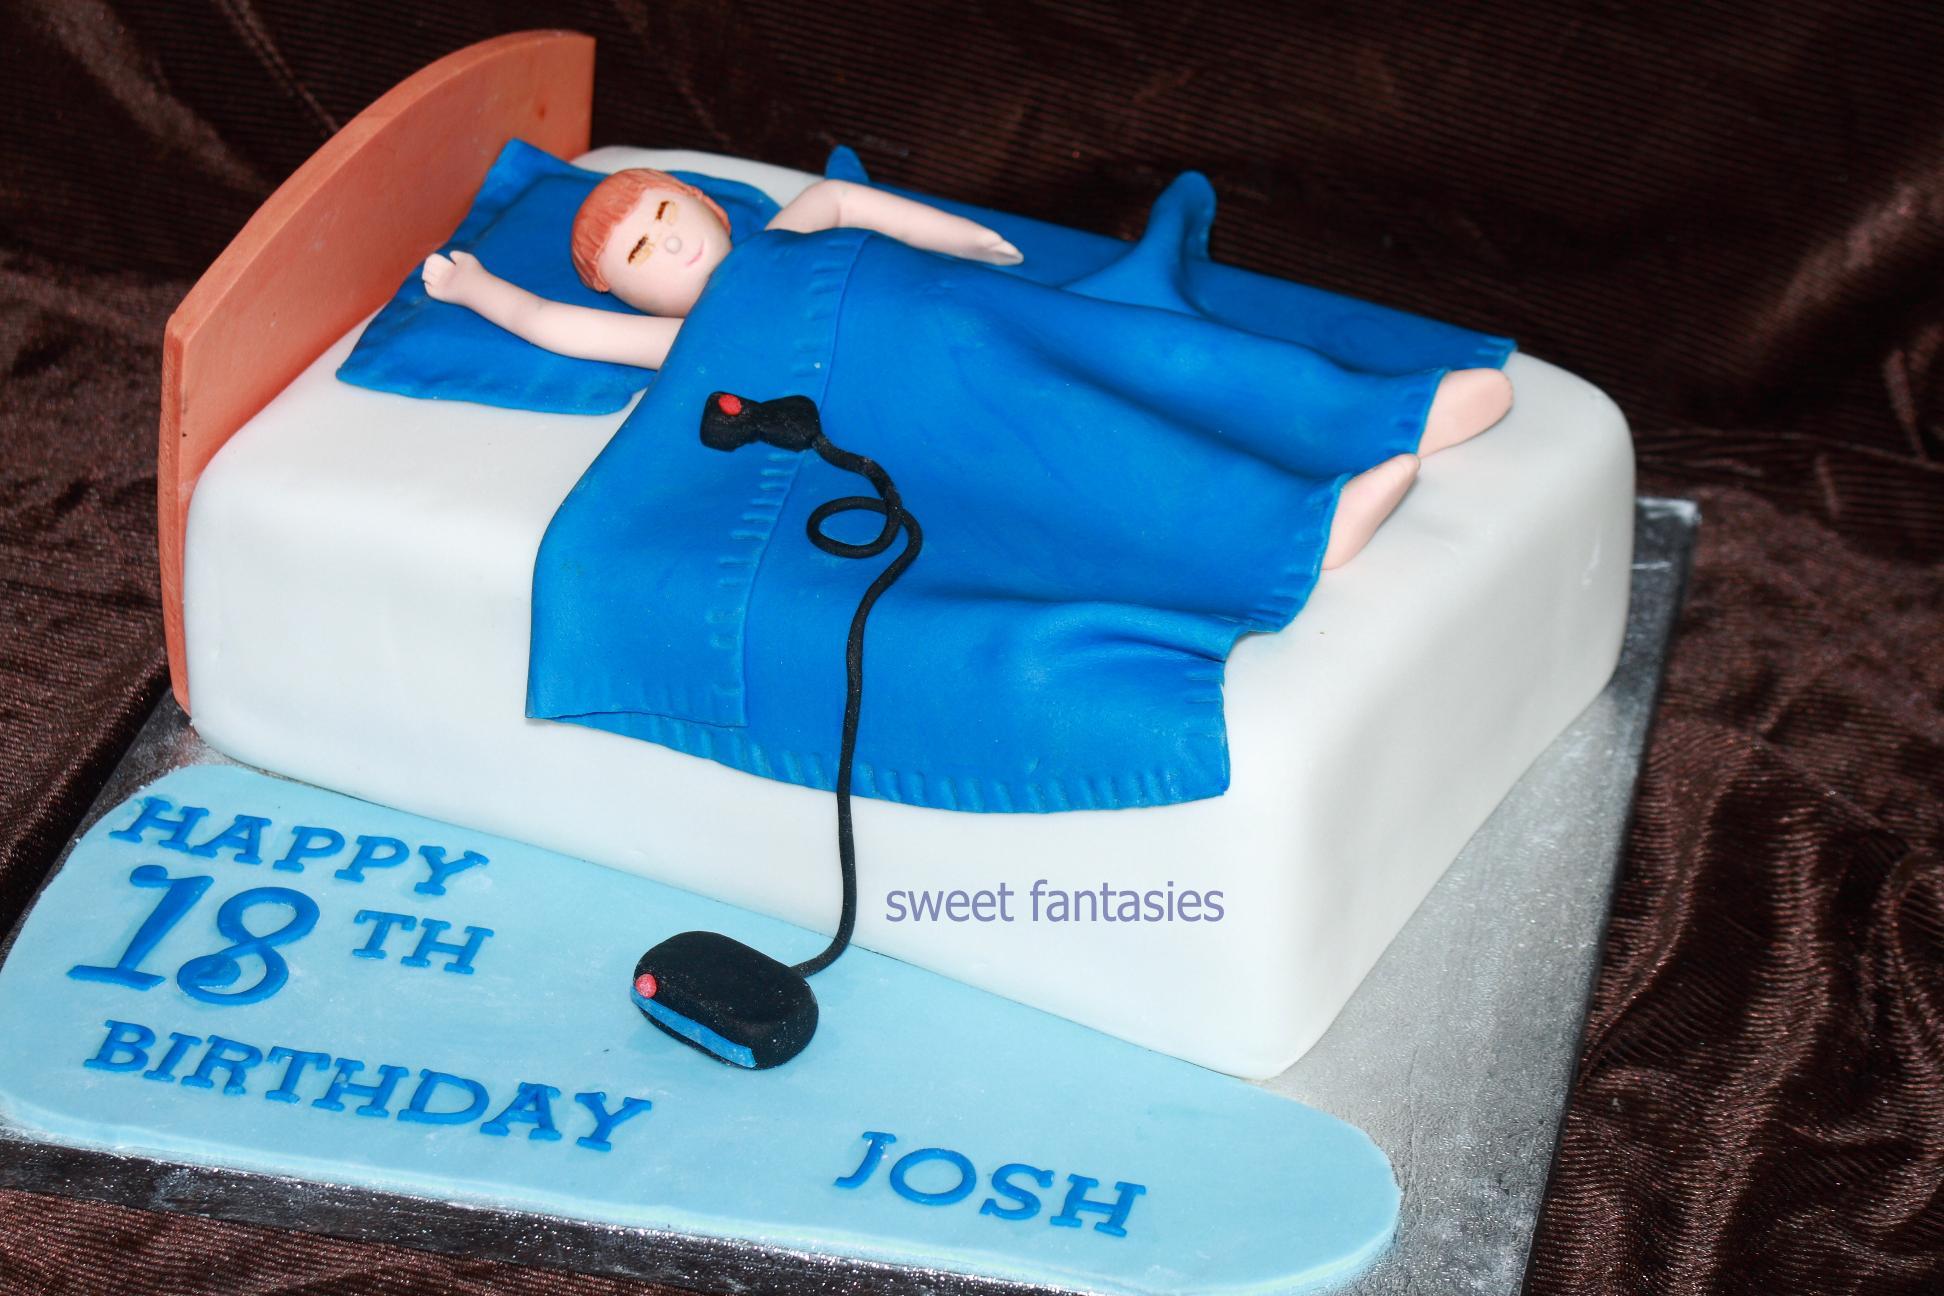 10 18th Birthday Cakes For Men Photo 18th Birthday Cake Ideas For